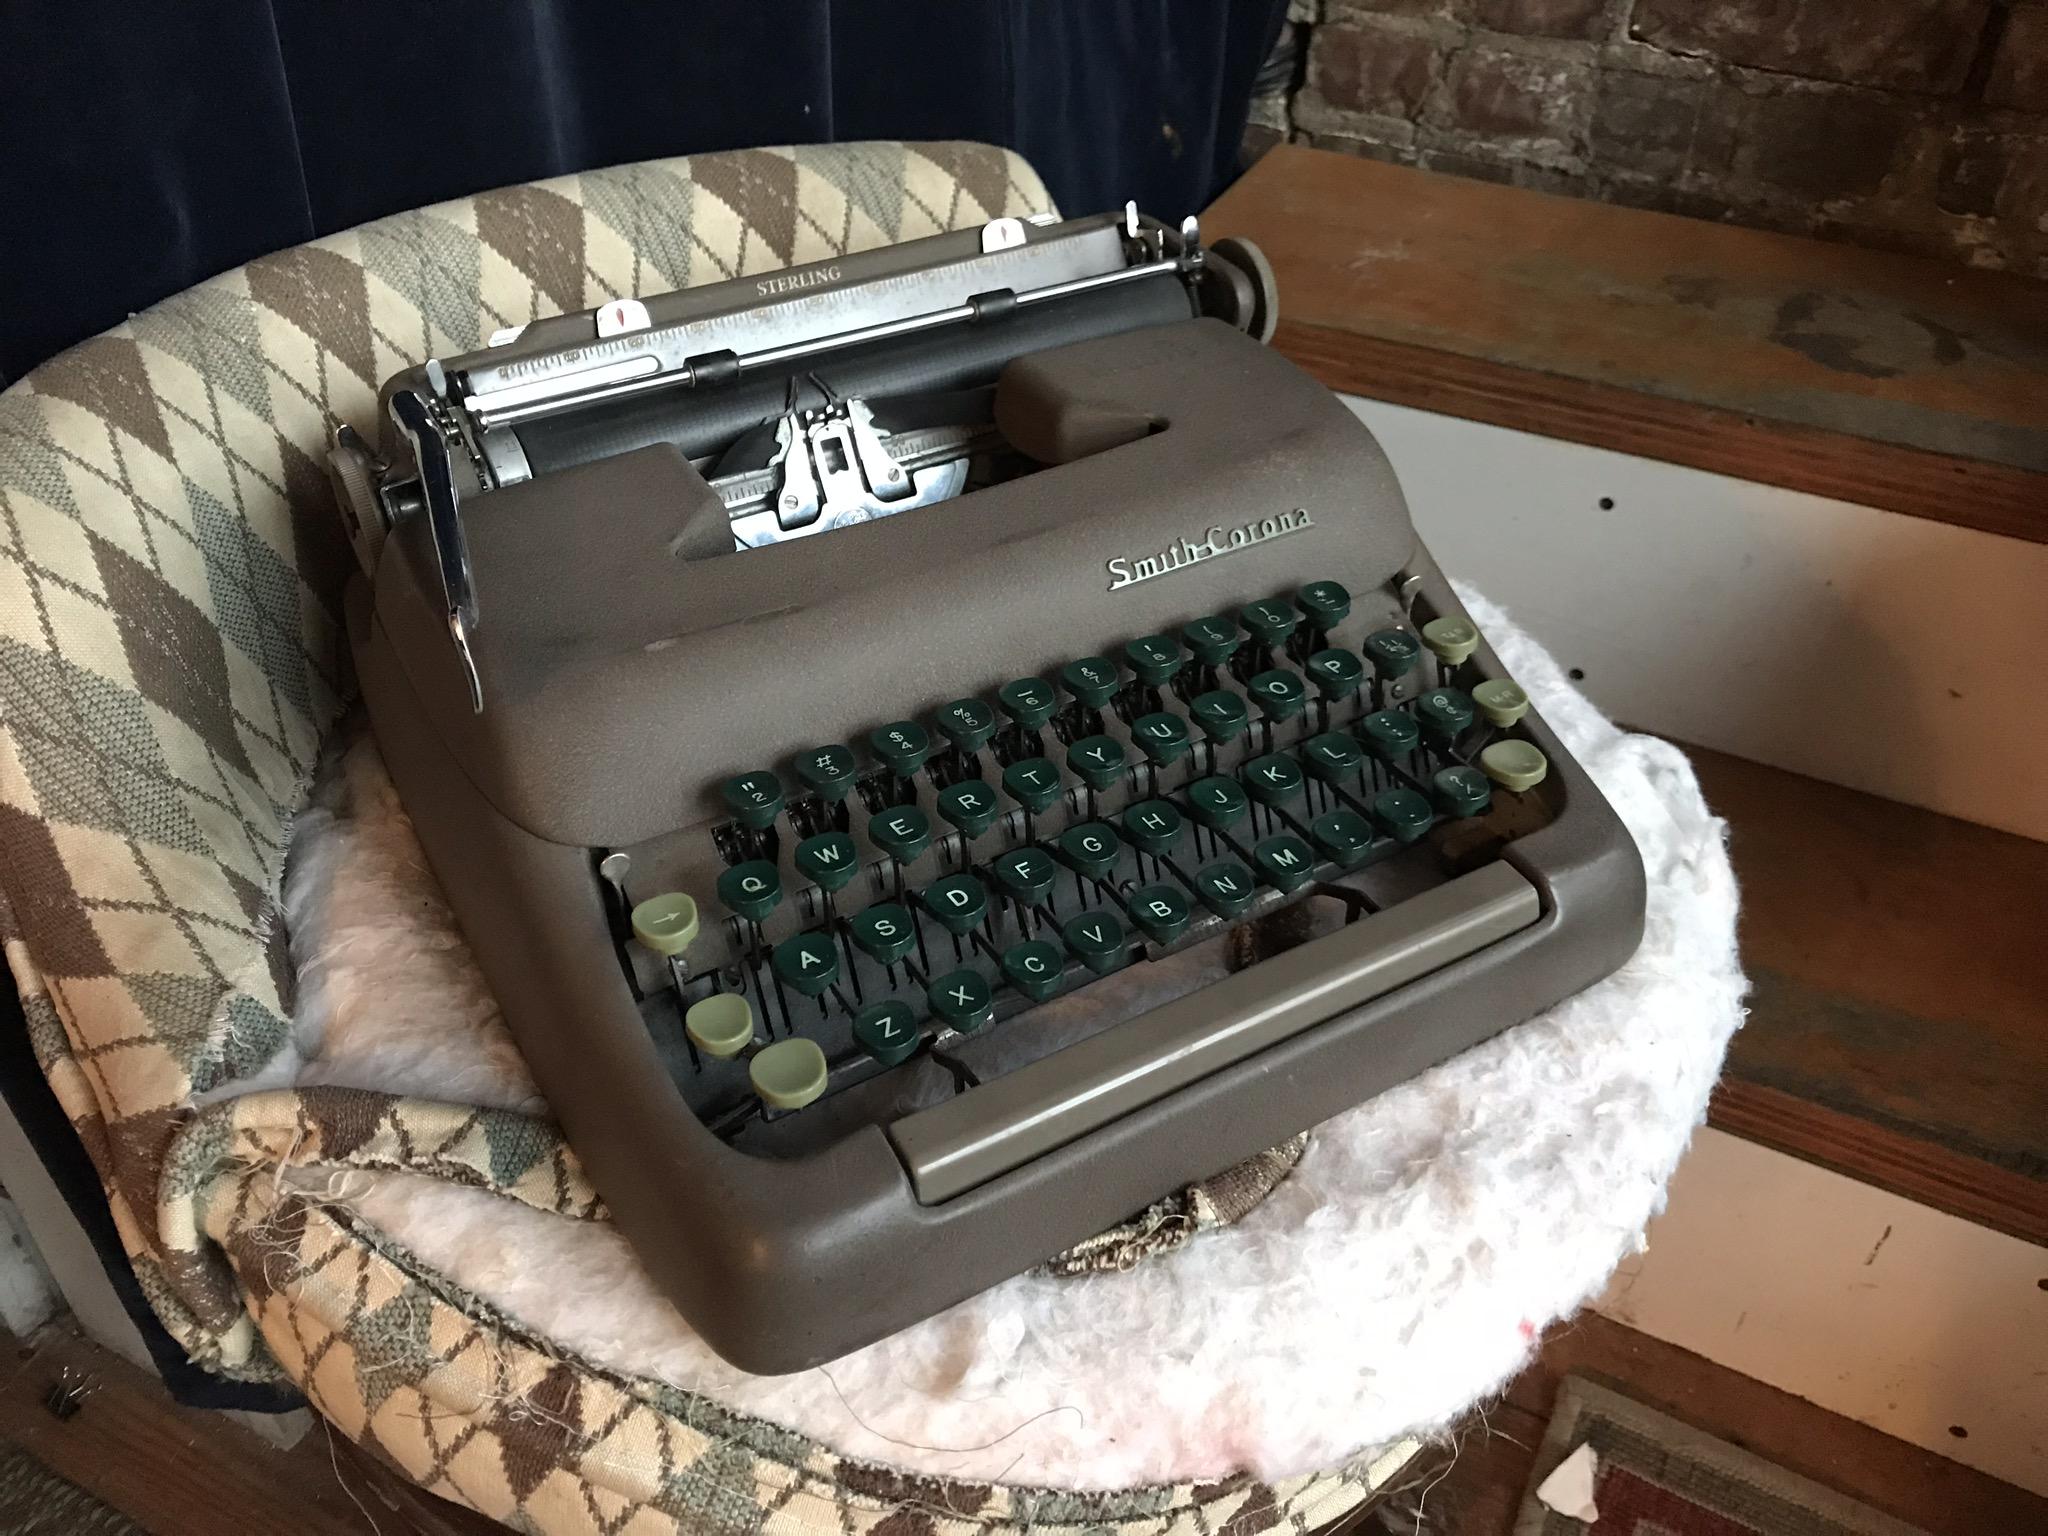 1952 SMITH CORONA TYPEWRITER $45